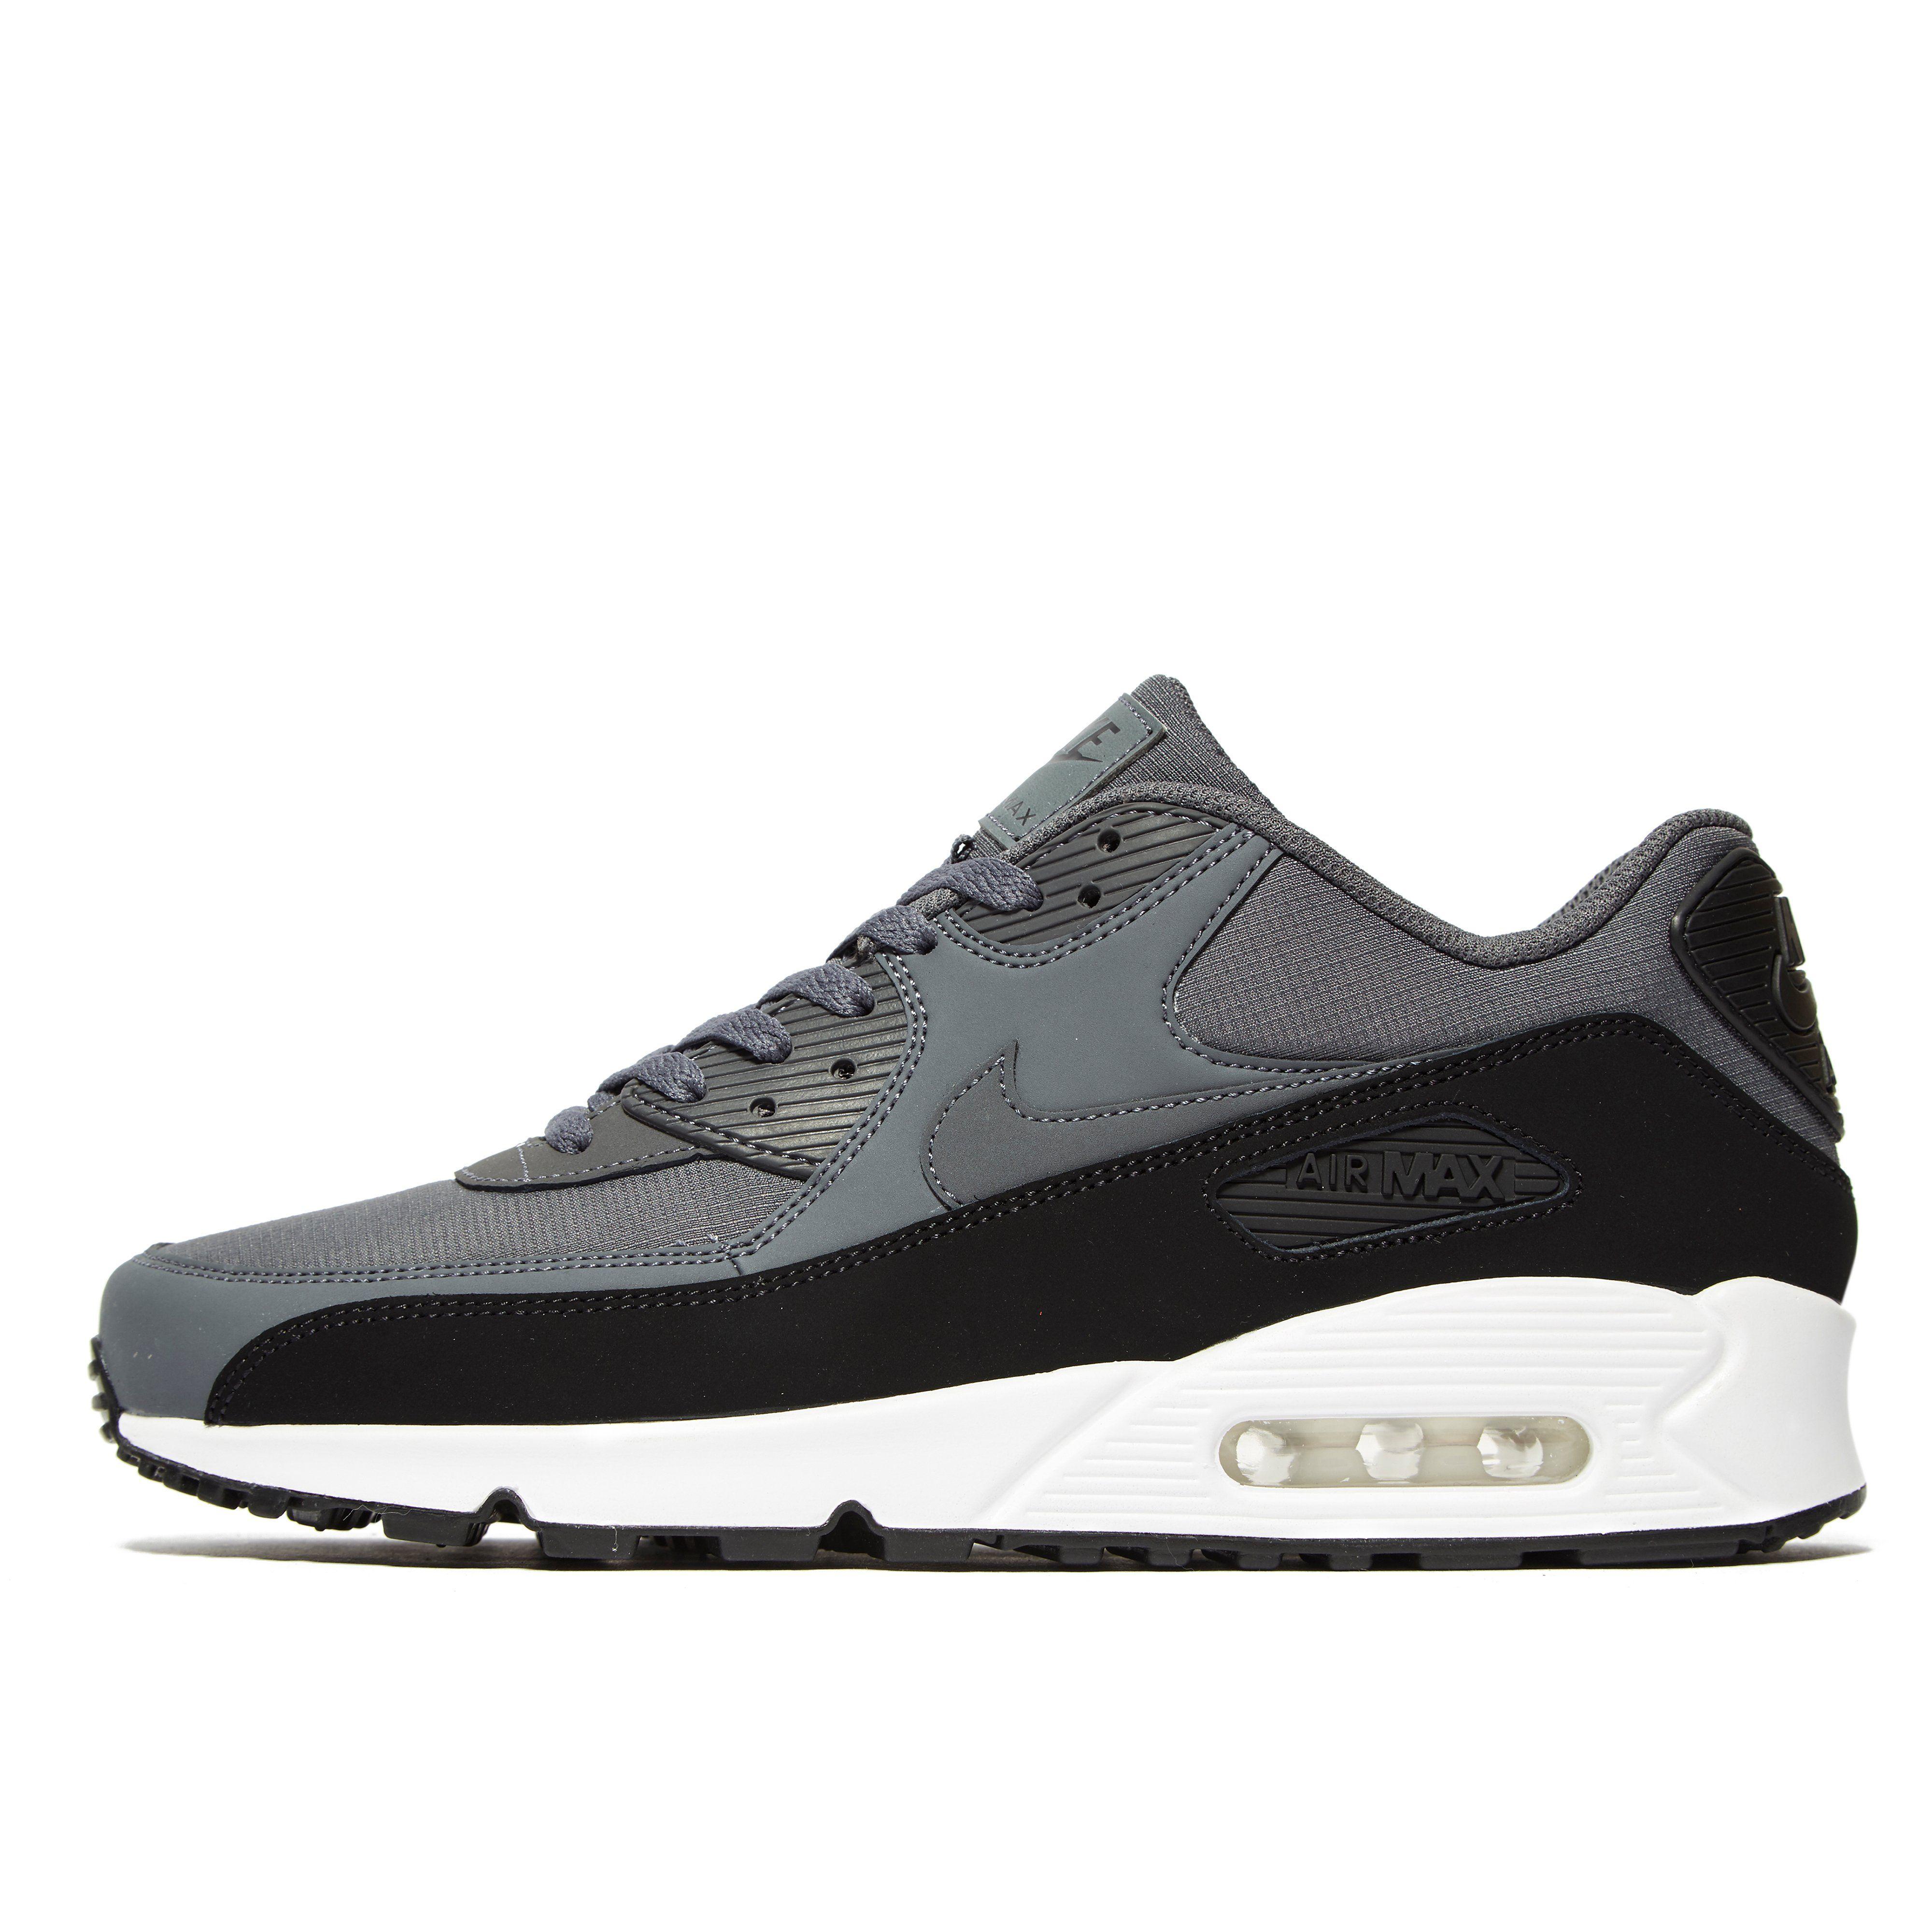 Nike - Fashion/Mode - Air Max 90 Essential - Taille 43 - Gris